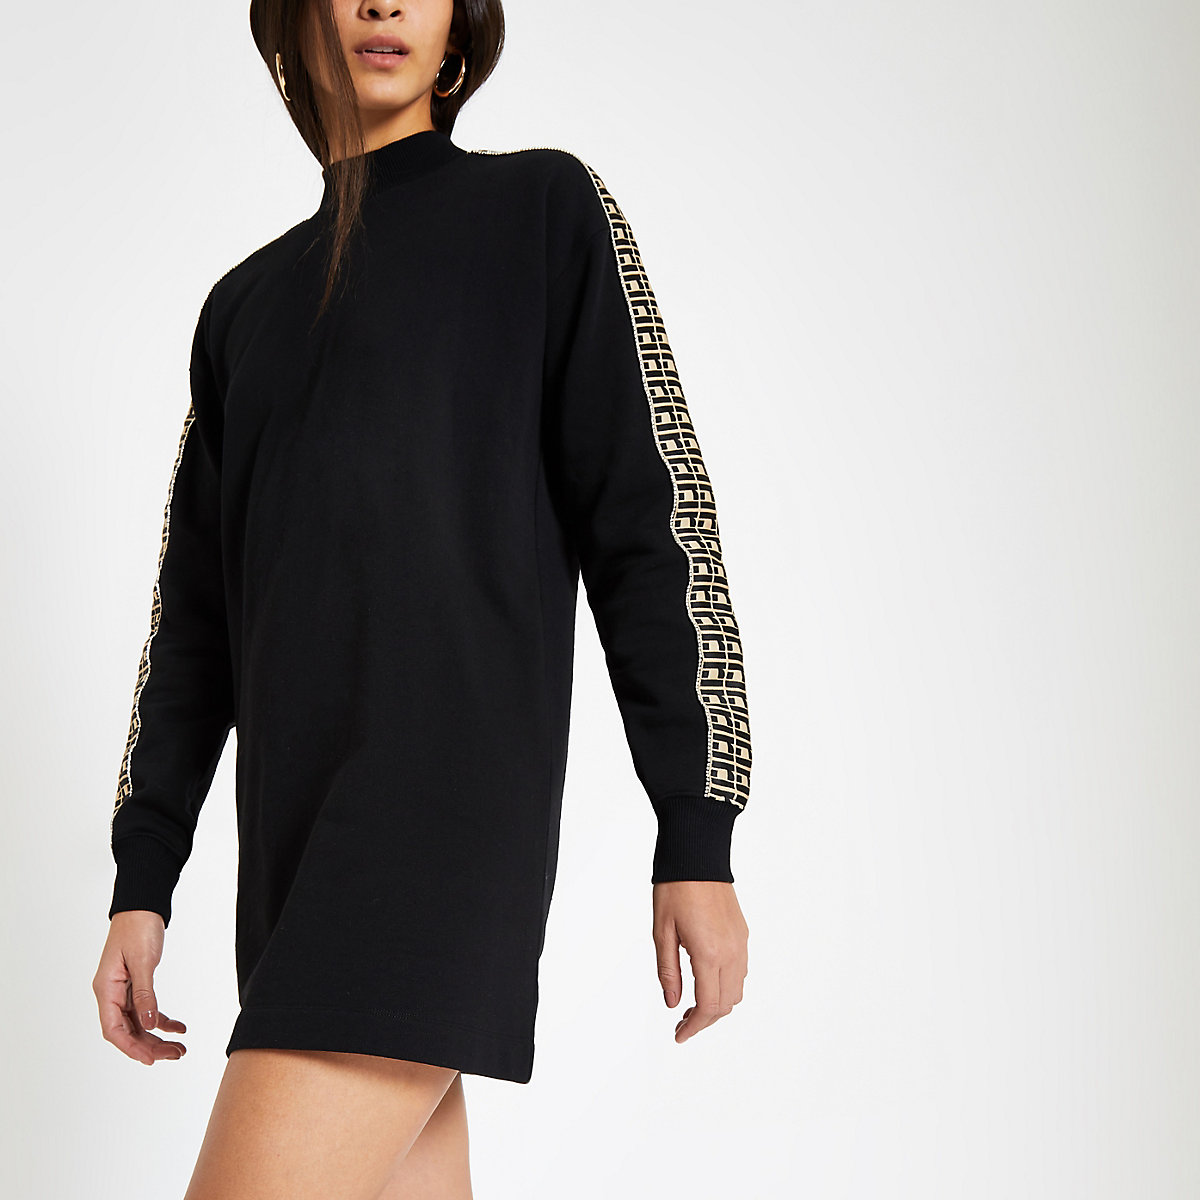 Black RI rhinestone trim sweater dress